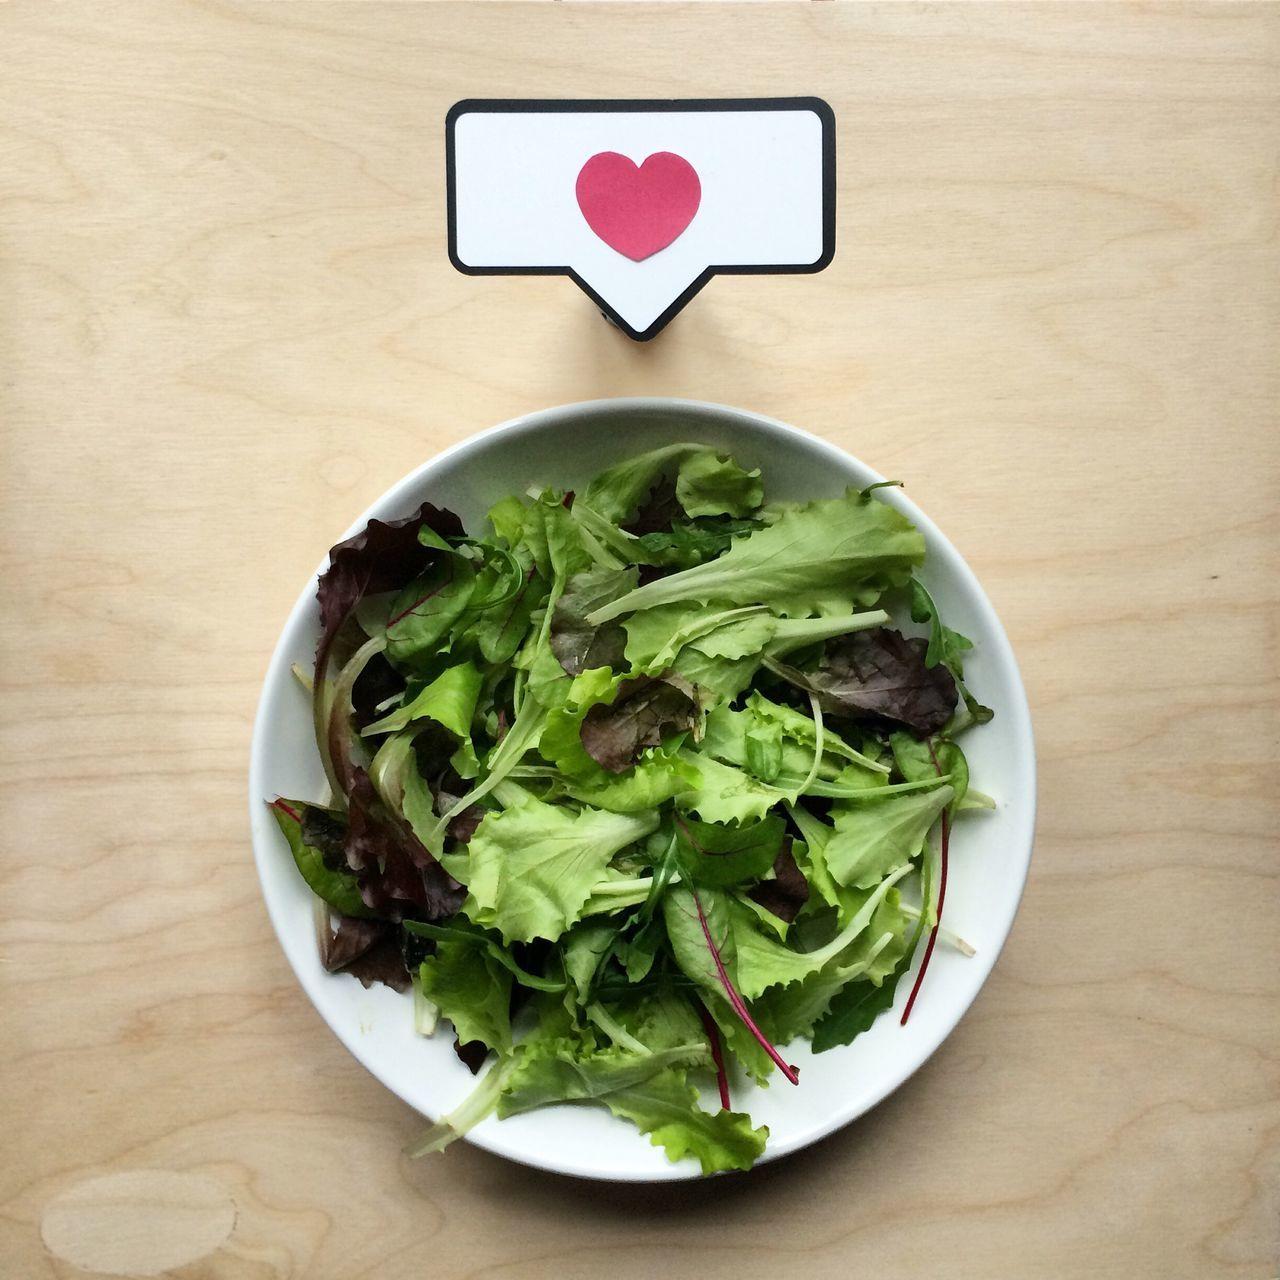 Beautiful stock photos of heart, Arrow Symbol, Arugula, Bowl, Day